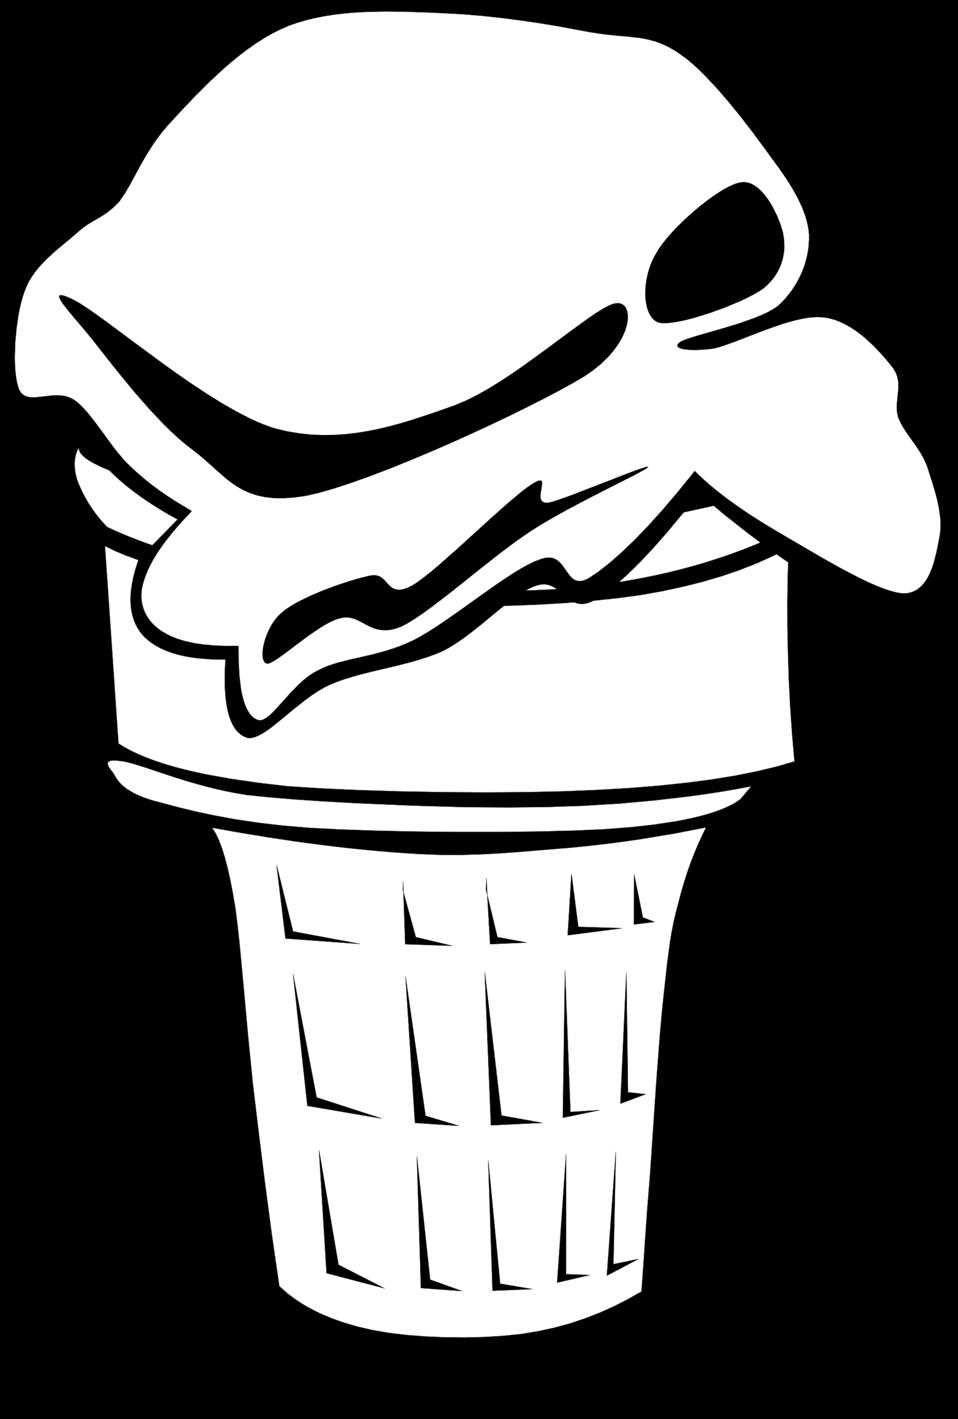 Public domain clip art. Desserts clipart black and white